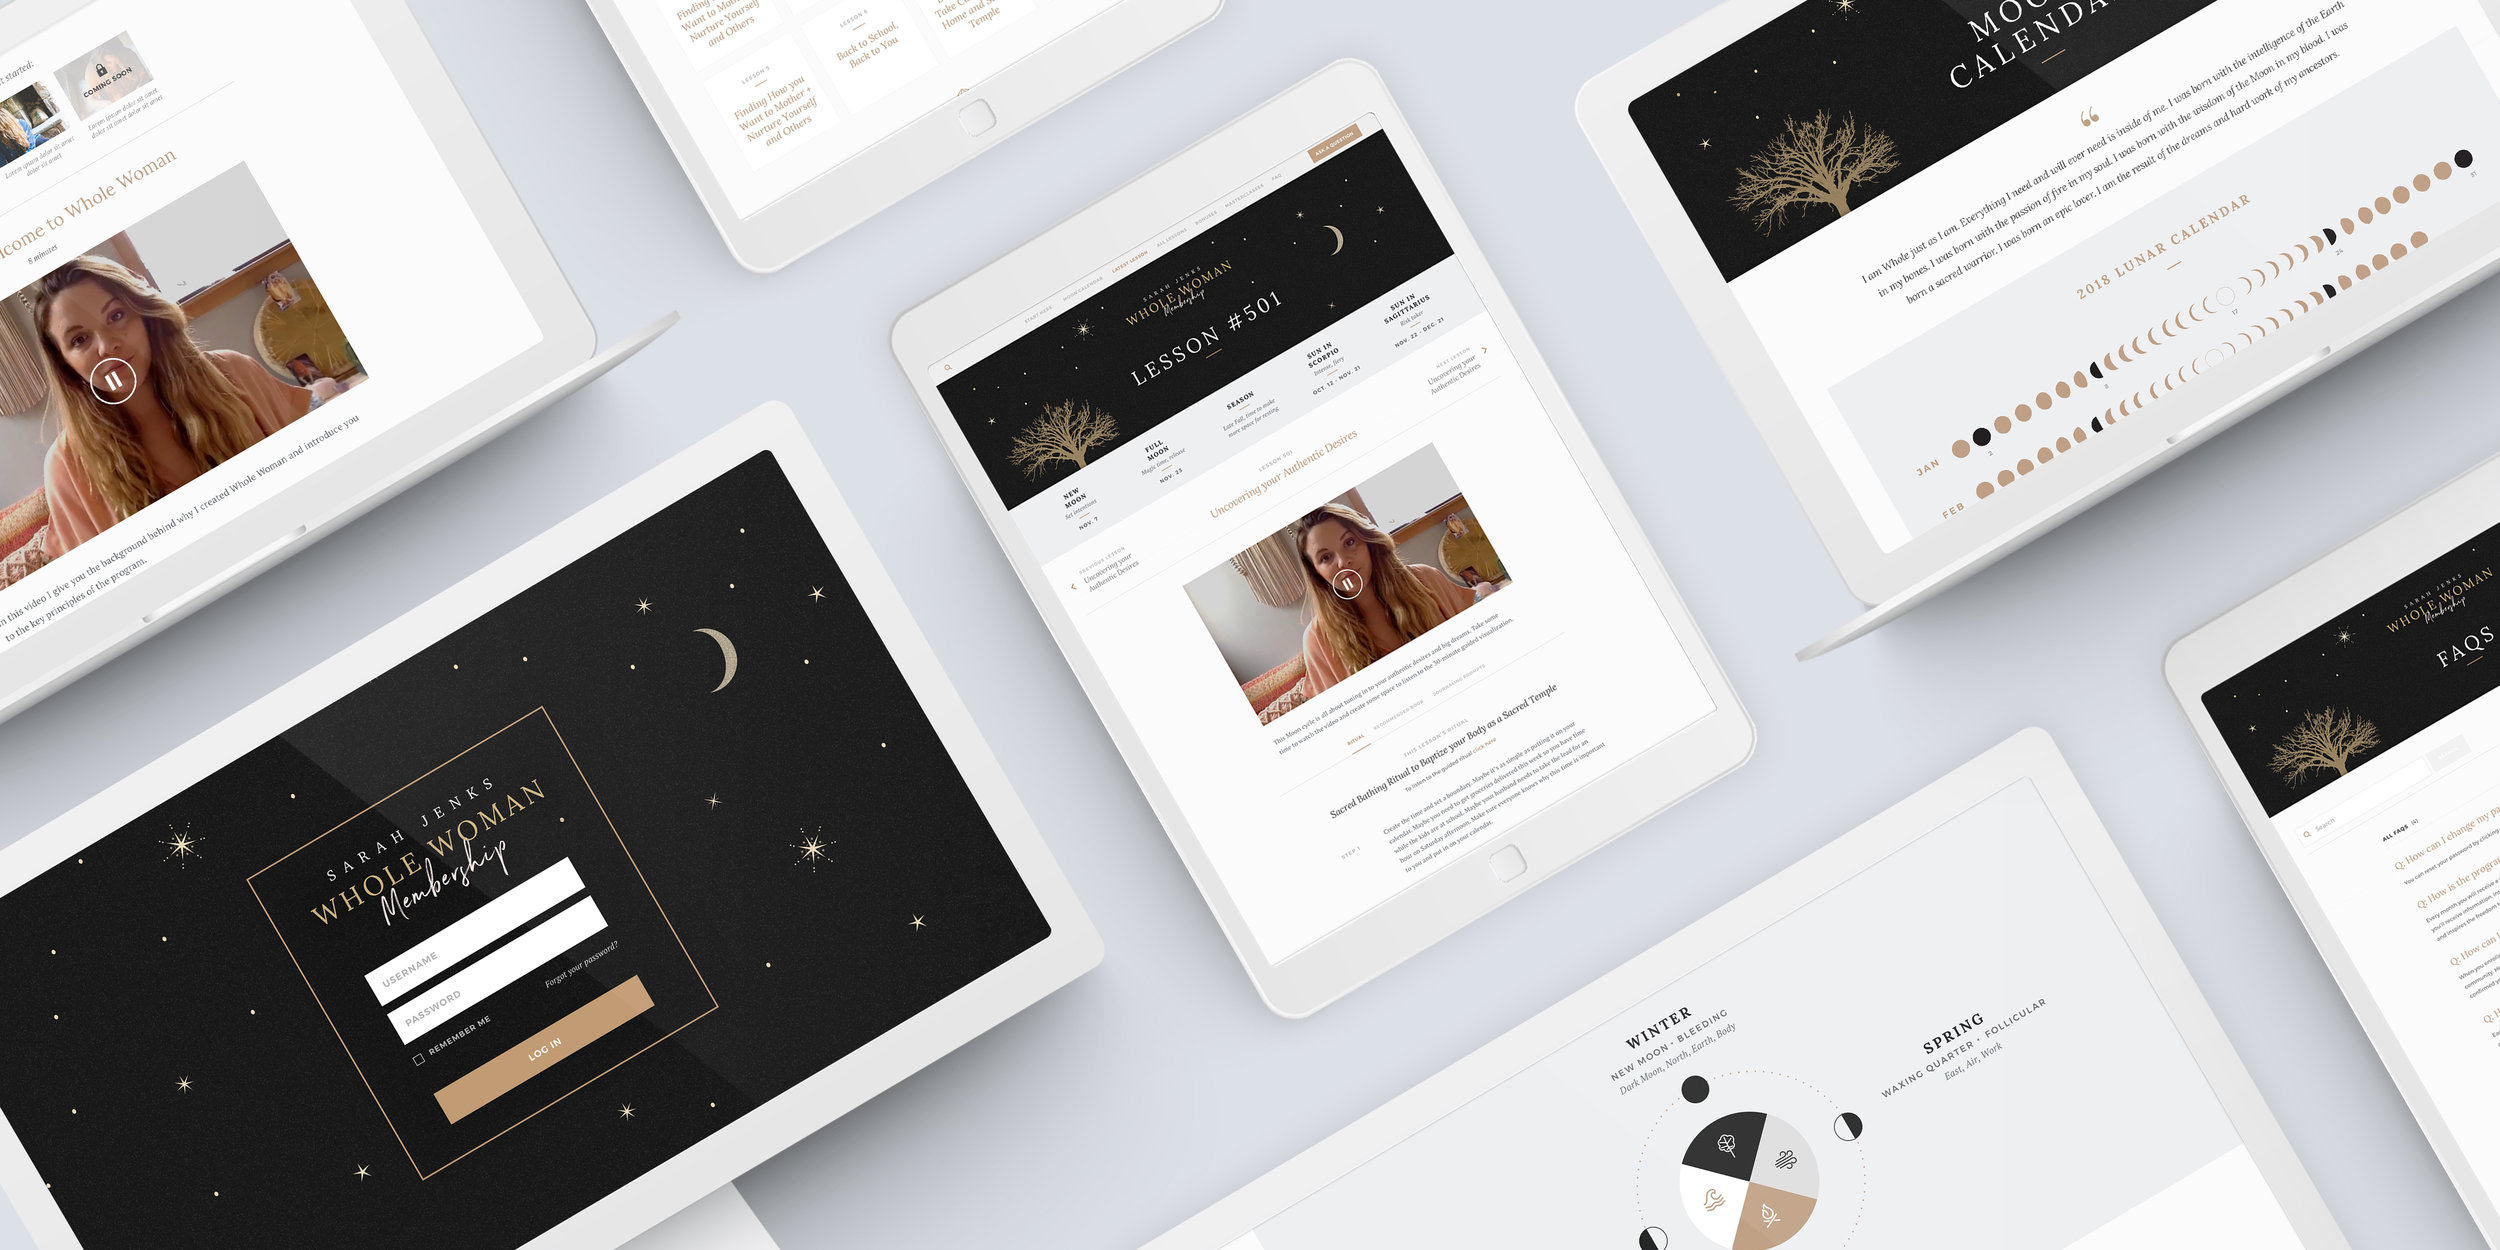 Sarah Jenks - Whole Woman Platform - branding, web design, ux design